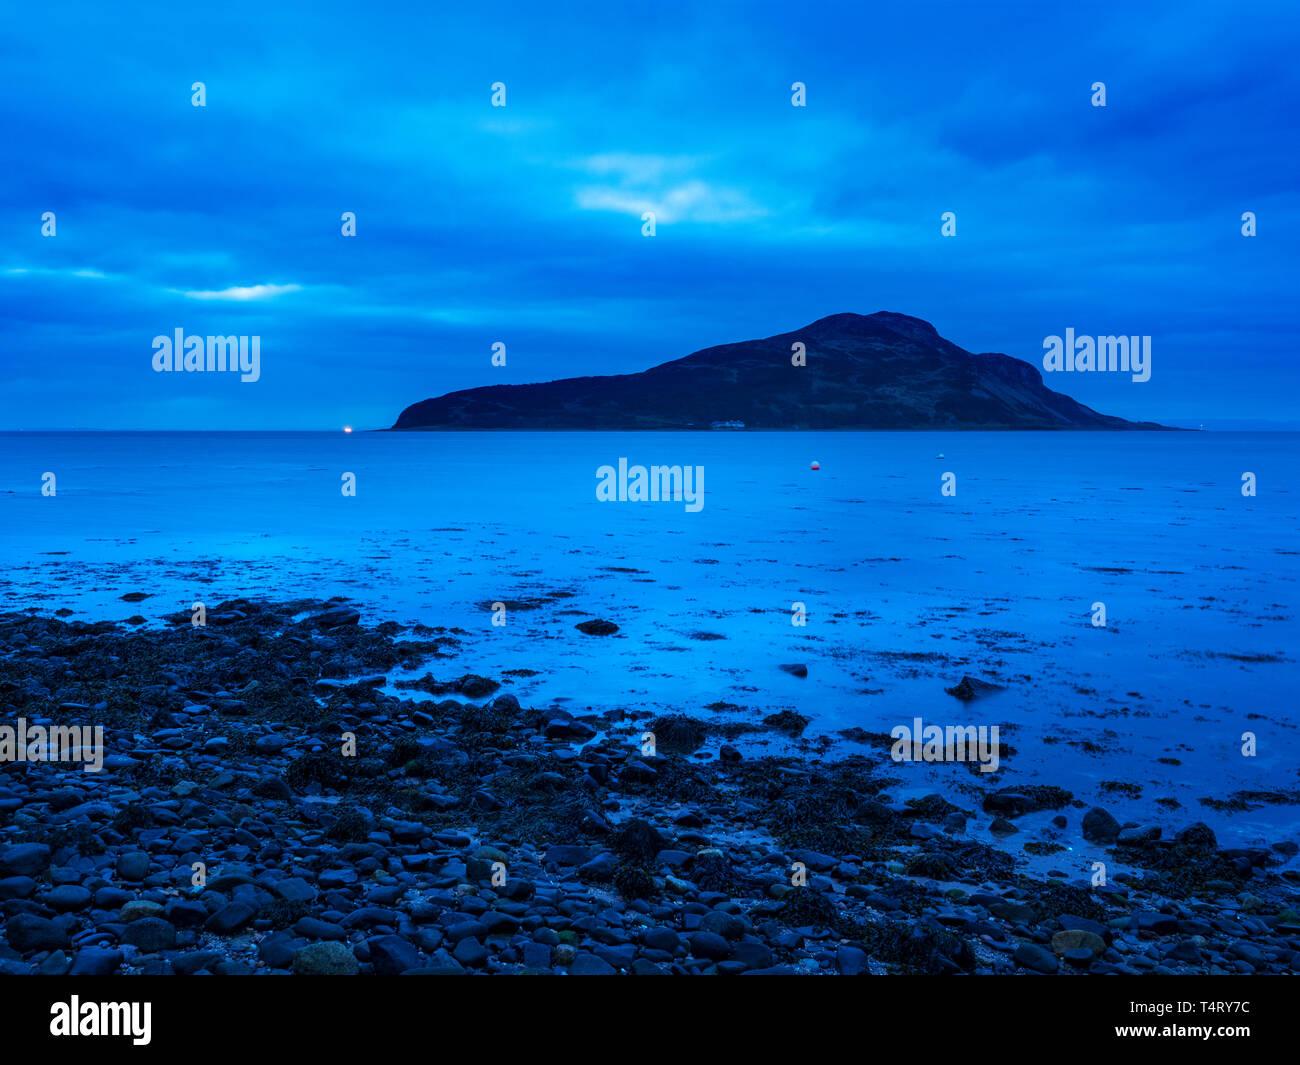 Holy Isle at dawn from Lamlash on the Isle of Arran North Ayrshire Scotland - Stock Image